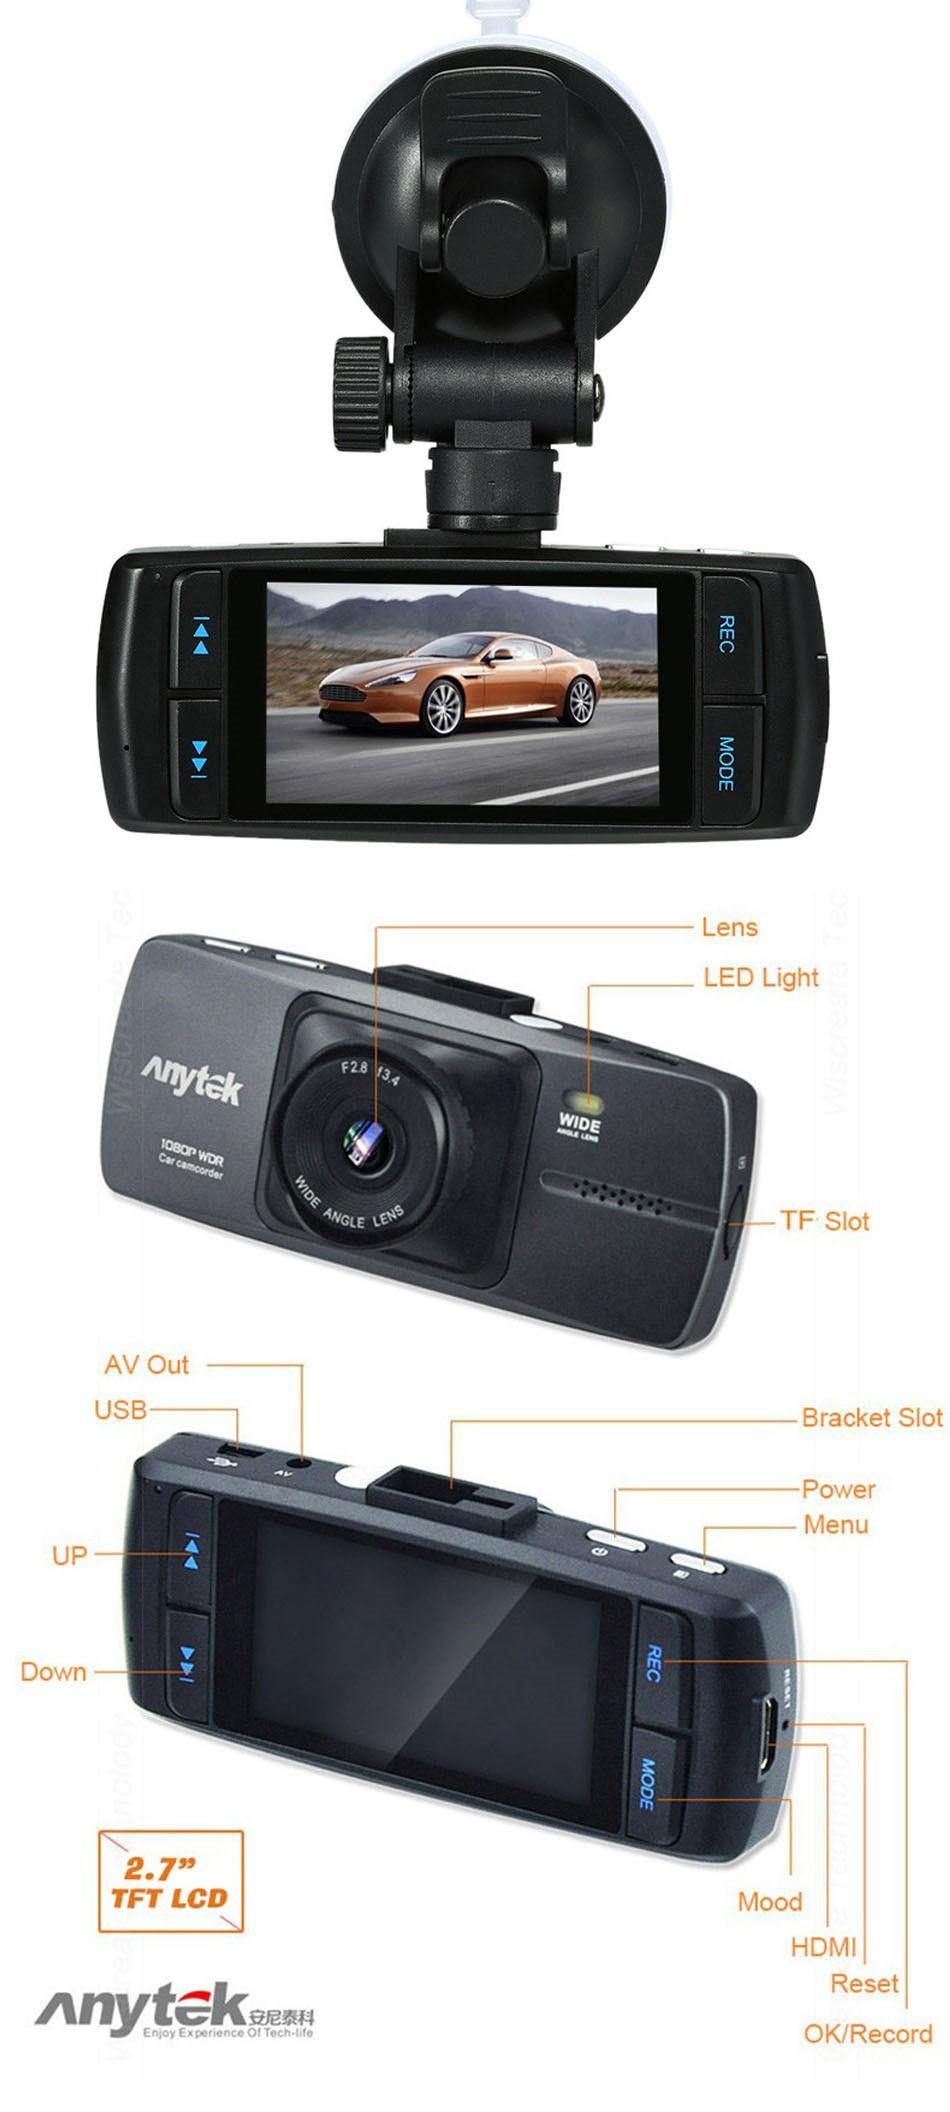 Anytek Dash Cam A88 2.7 Inch DVR Full HD 1080P Car Camera Novatek 96220 Parking Monitor Registrator Video Recorder Night Vision DVRS -03